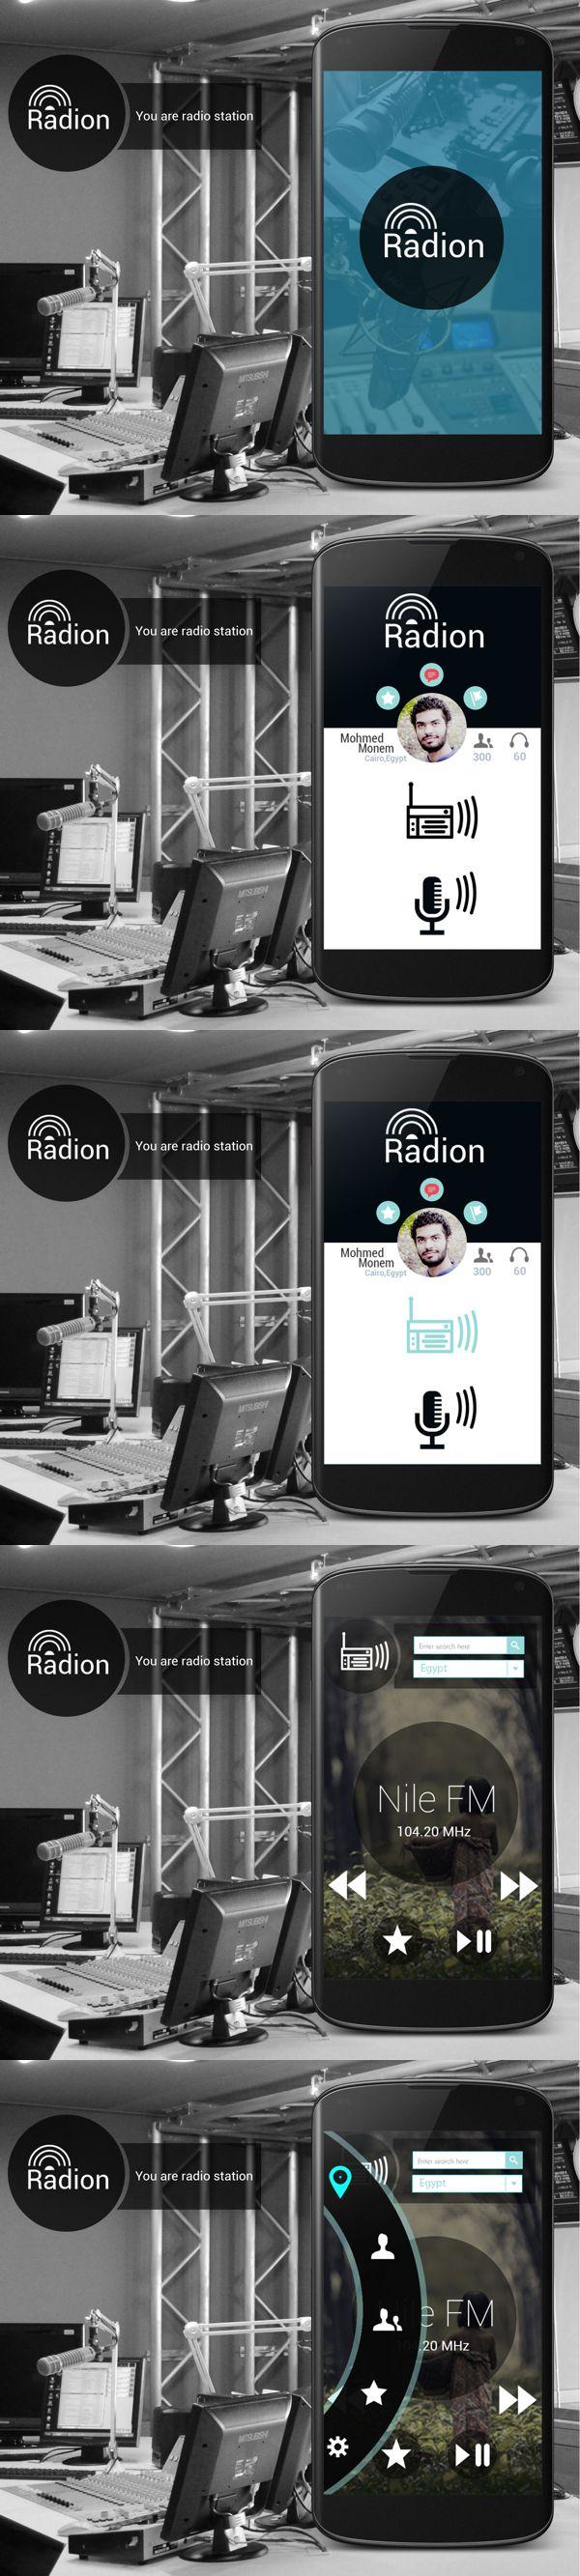 Radion App ui design